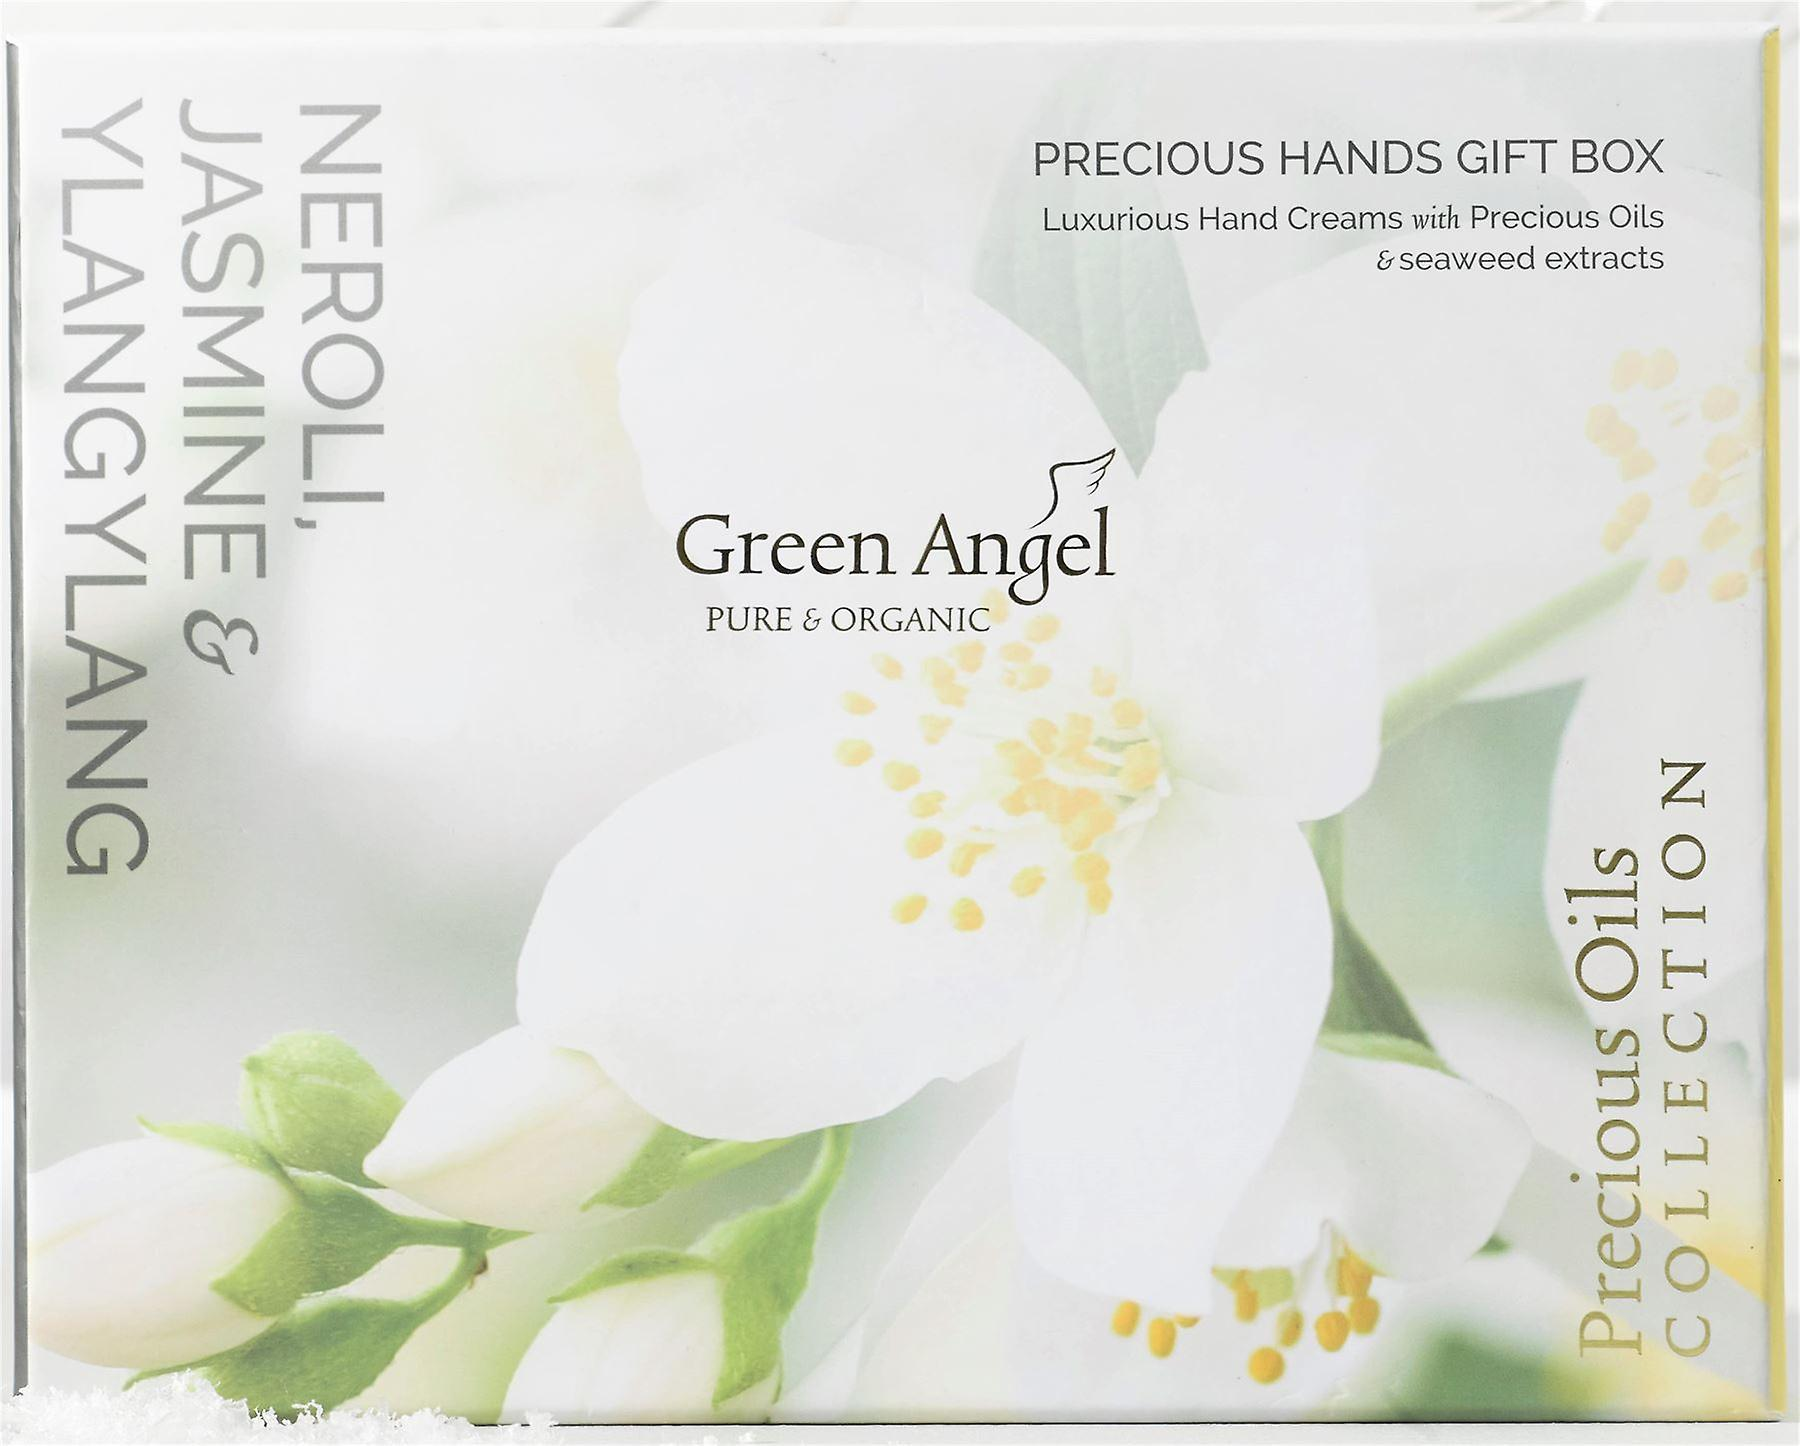 Green Angel Precious Oils Hand Gift Set